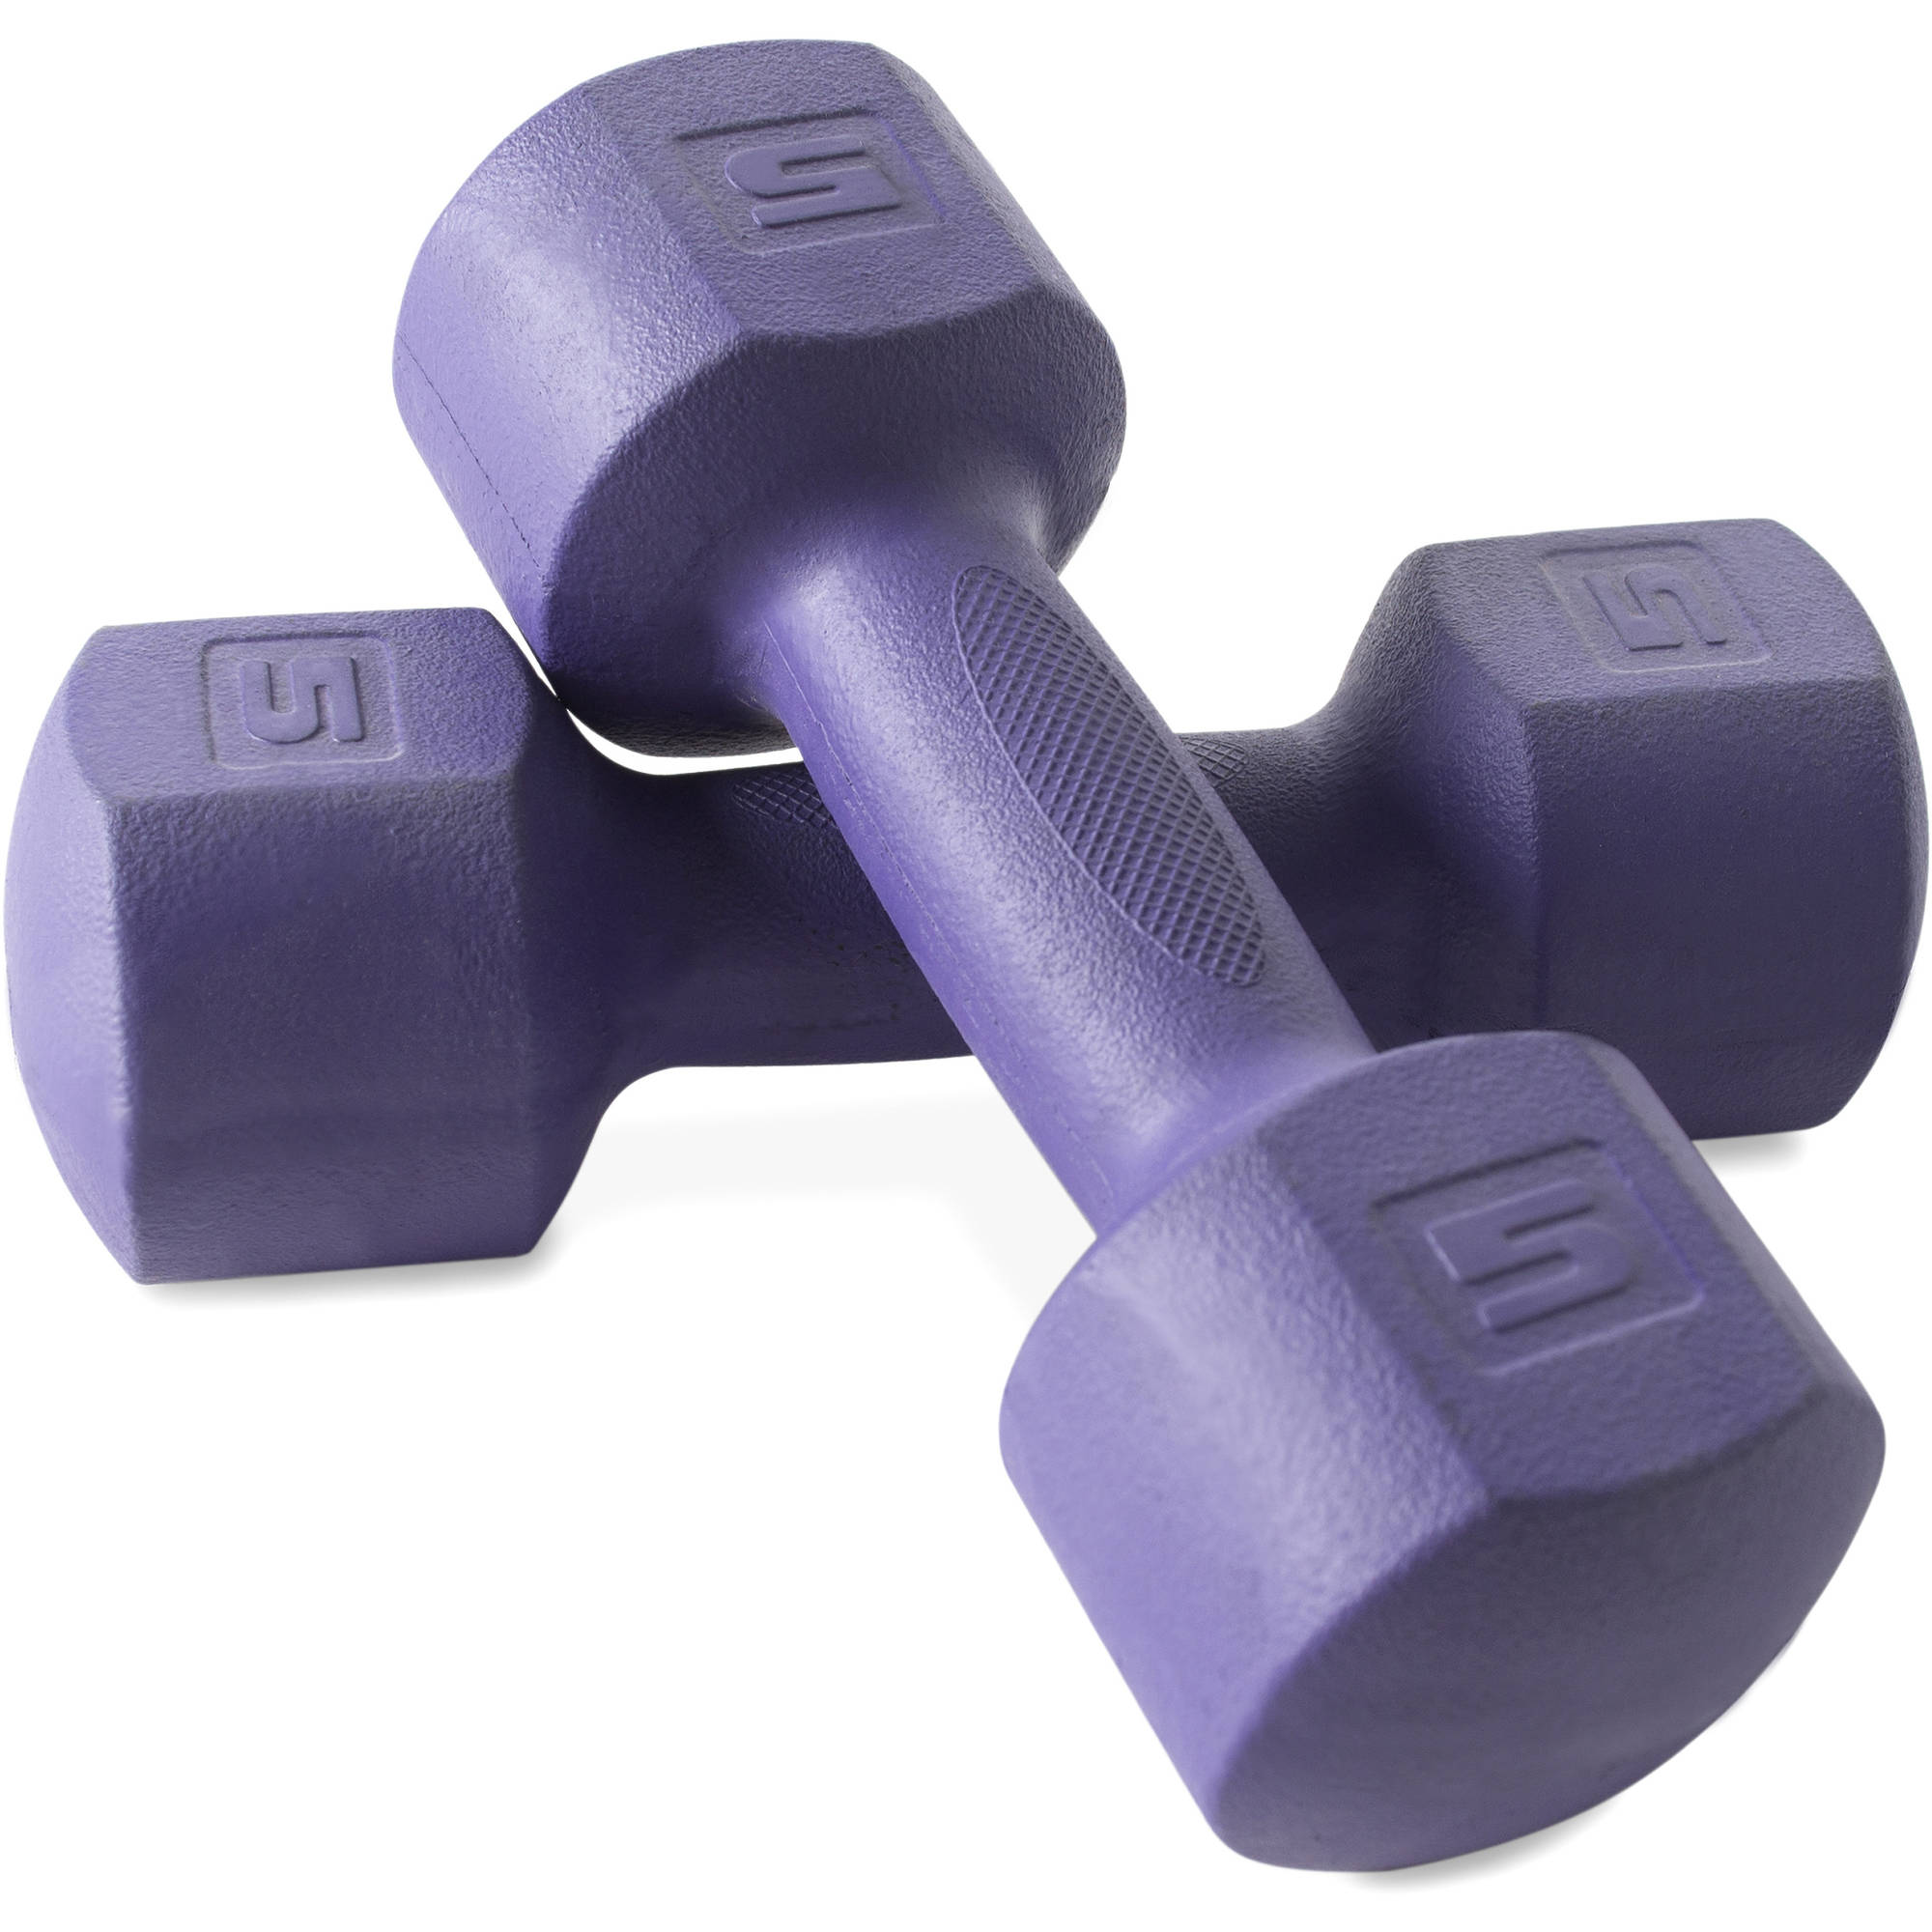 CAP Fitness 10 lb ECO Dumbbell Pair